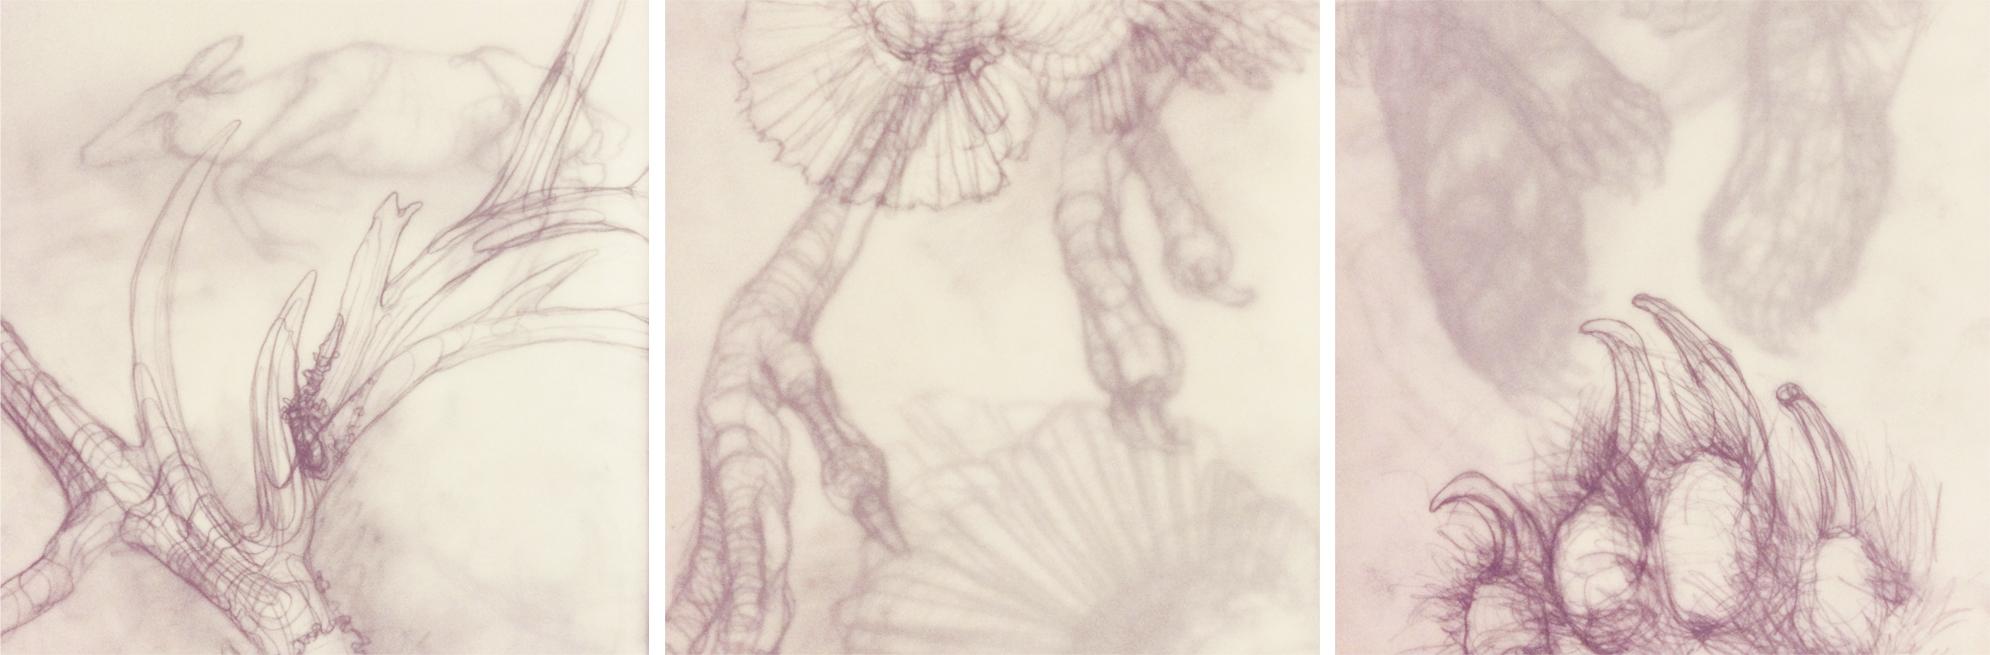 ley_lines_wildlife_triptych